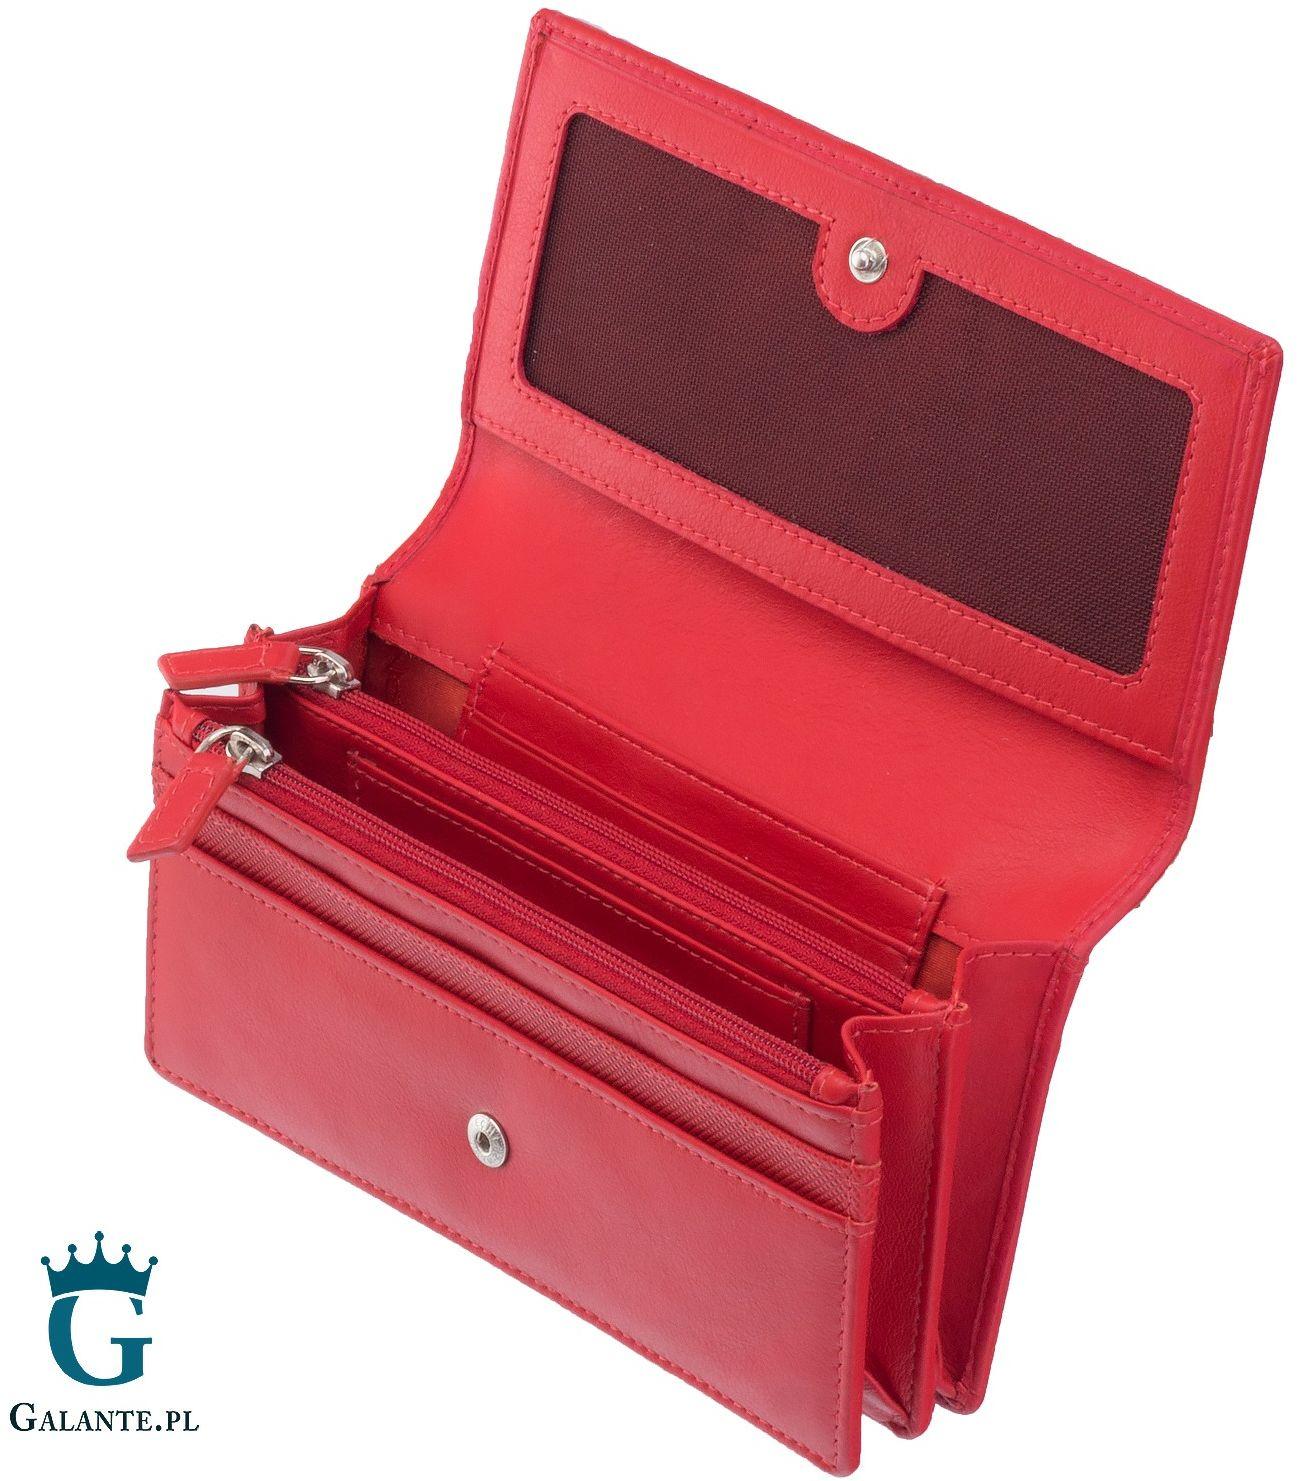 Zgrabny portfel damski valentini 15v-550 rfid